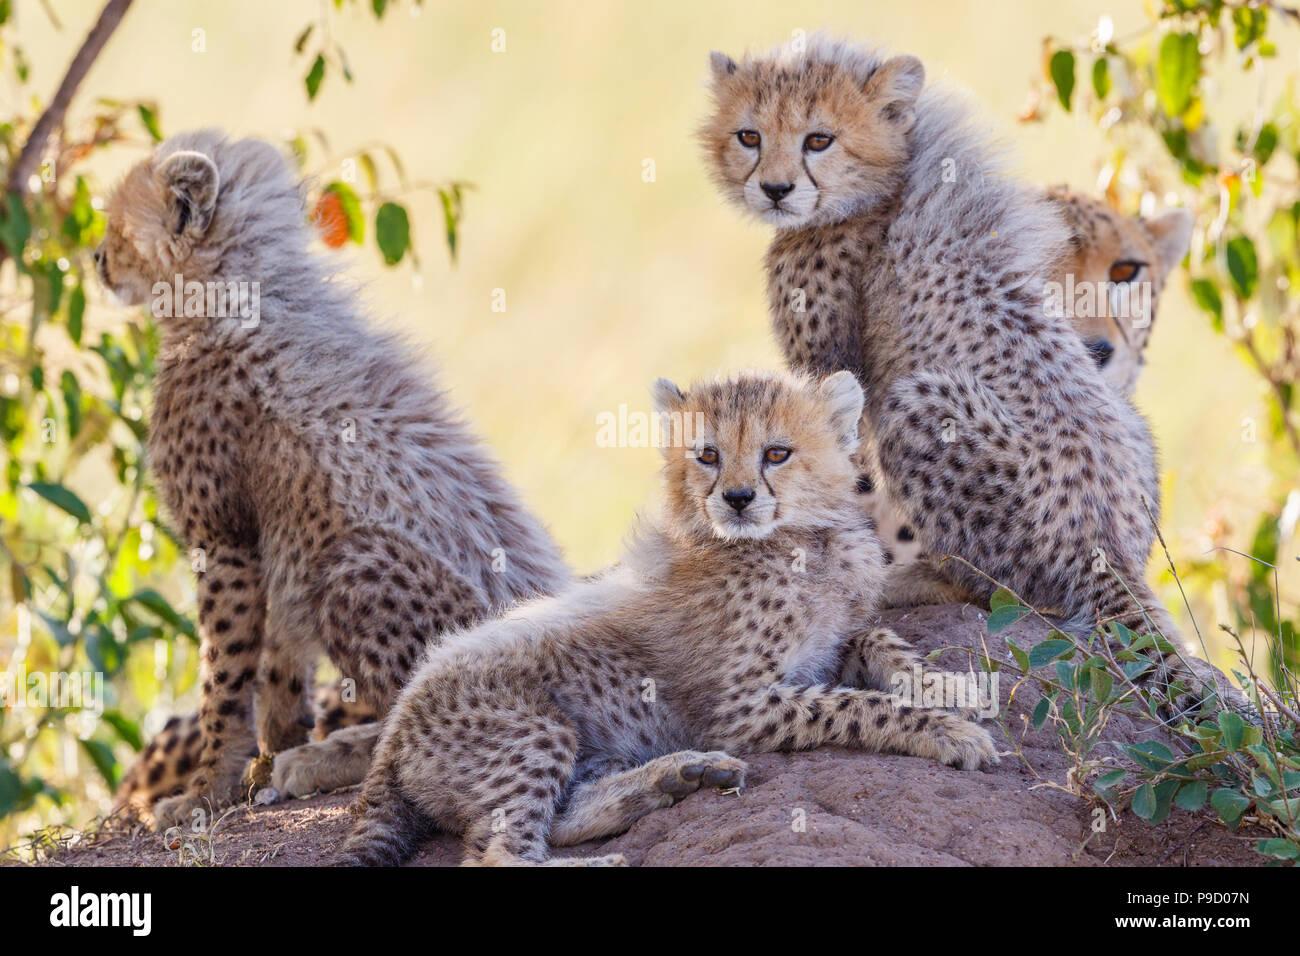 Curious cheetah cubs in the bush shadows - Stock Image